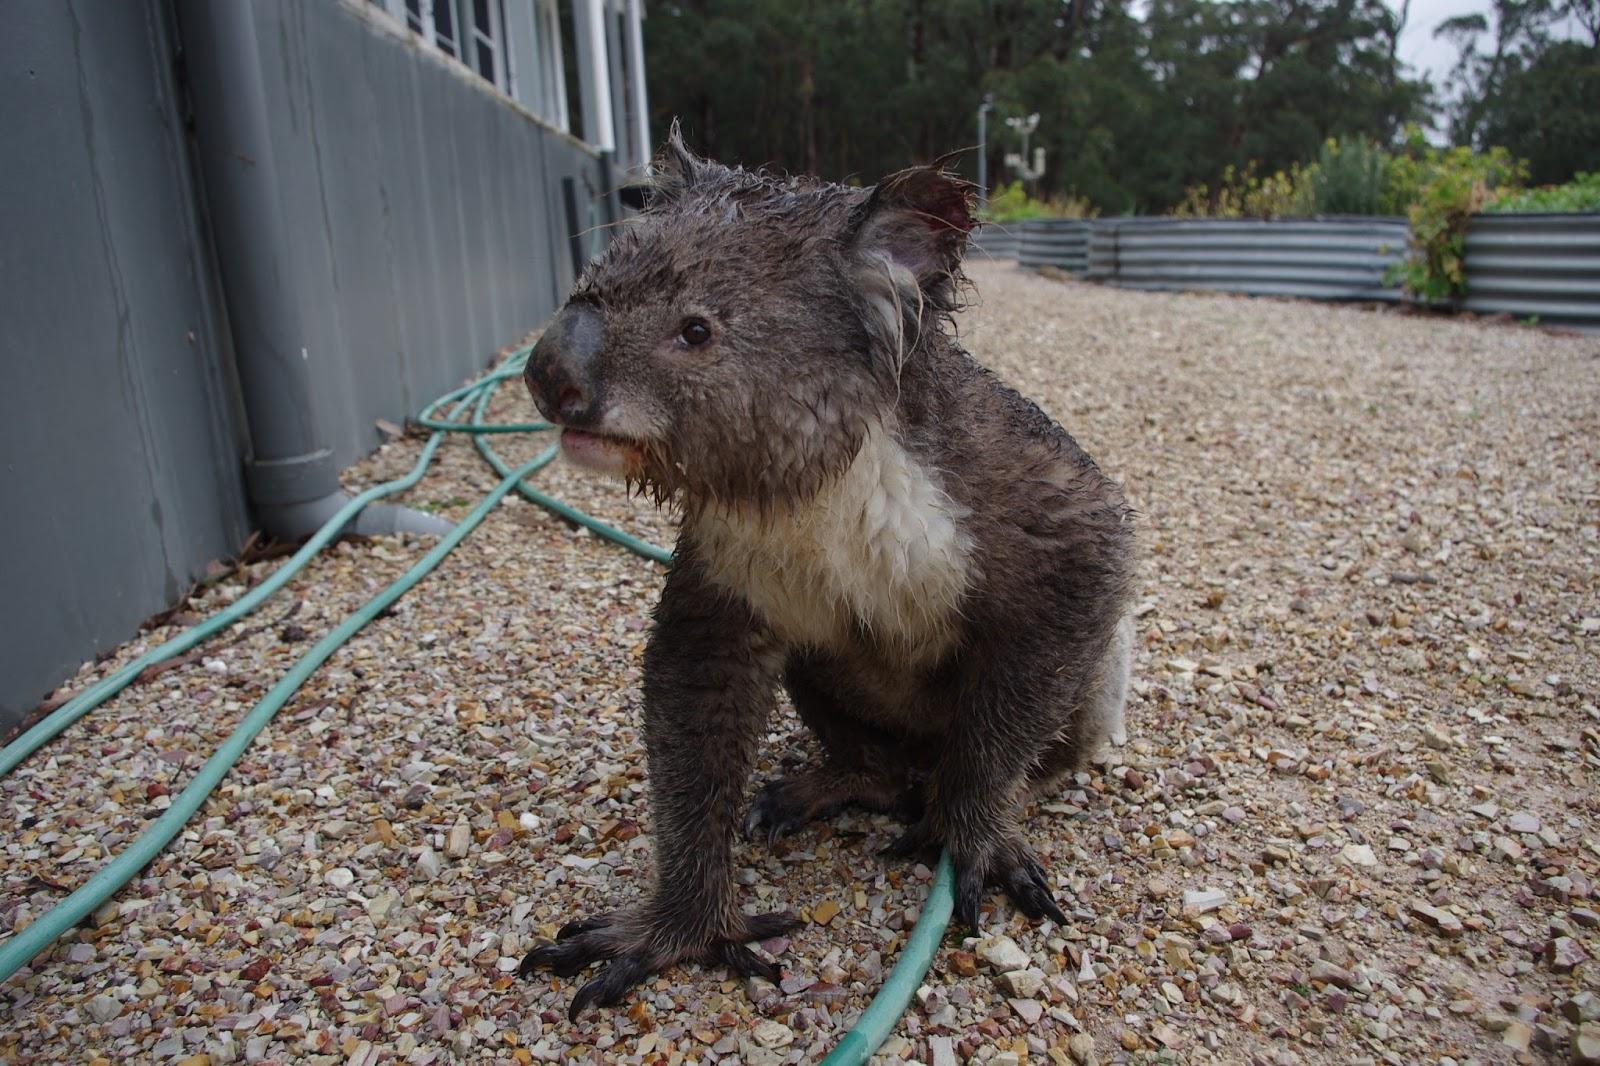 Close up of the Koala visitor